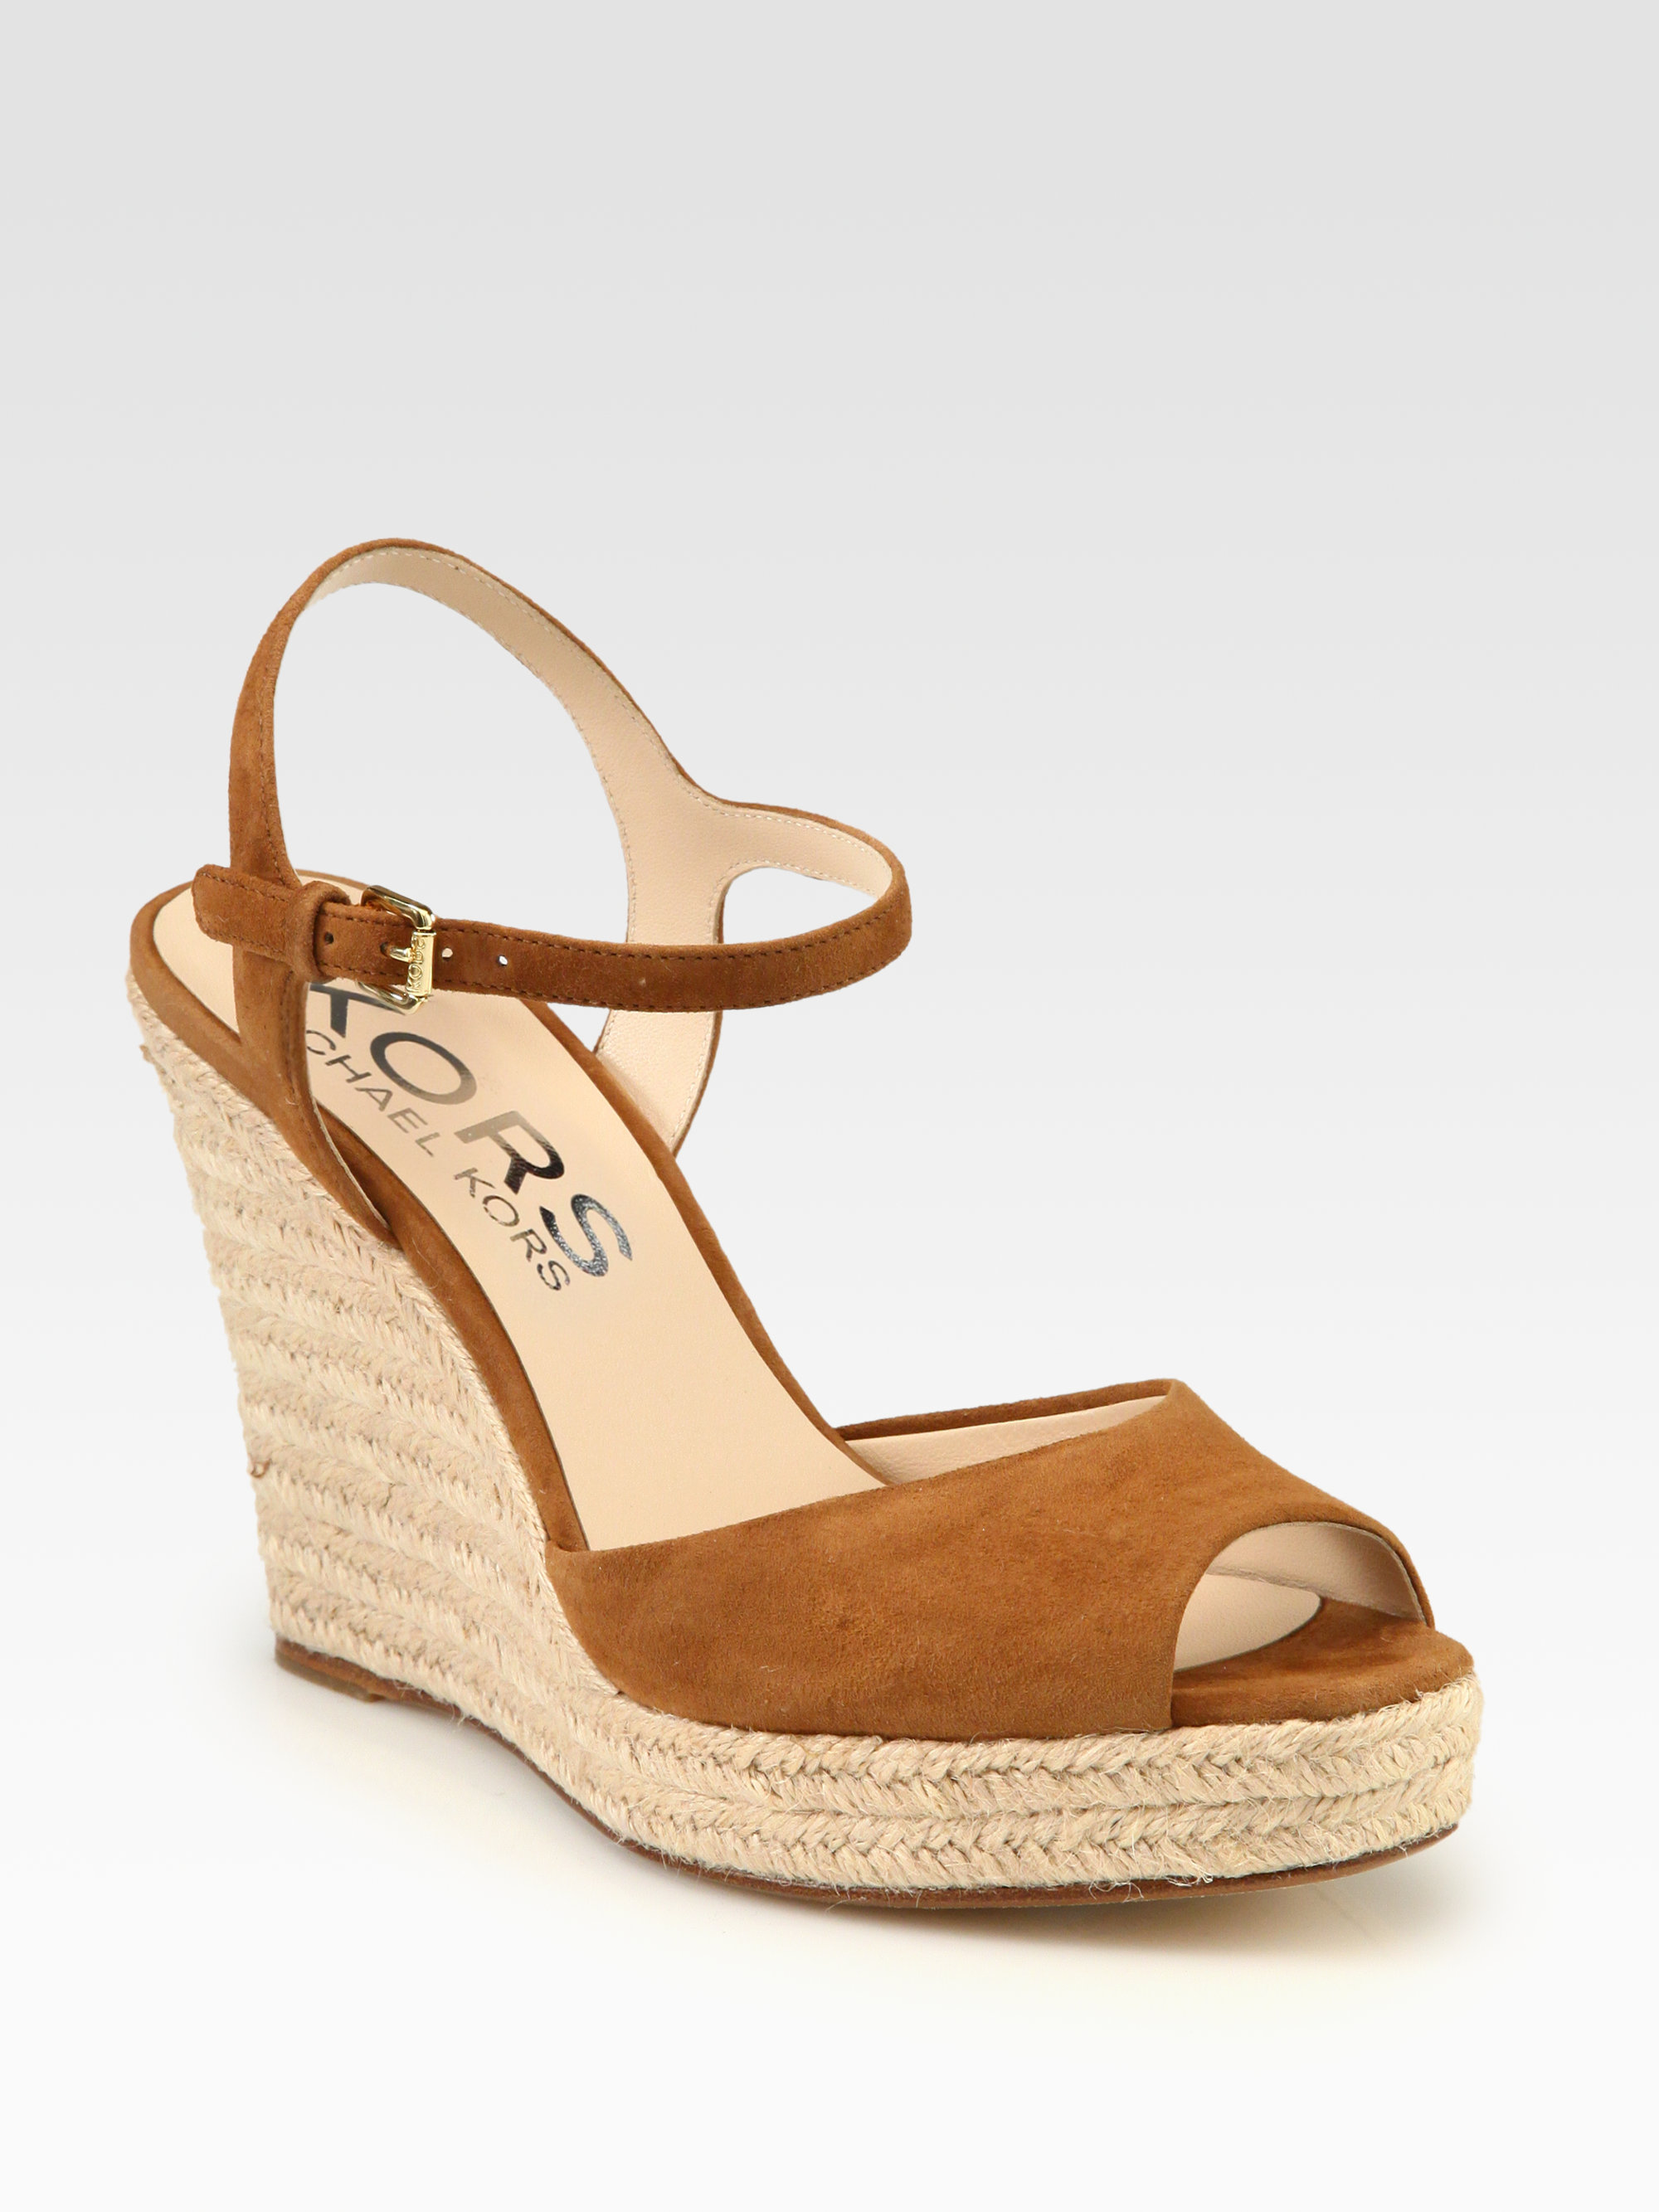 kors by michael kors valora suede espadrille wedge sandals in brown luggage lyst. Black Bedroom Furniture Sets. Home Design Ideas